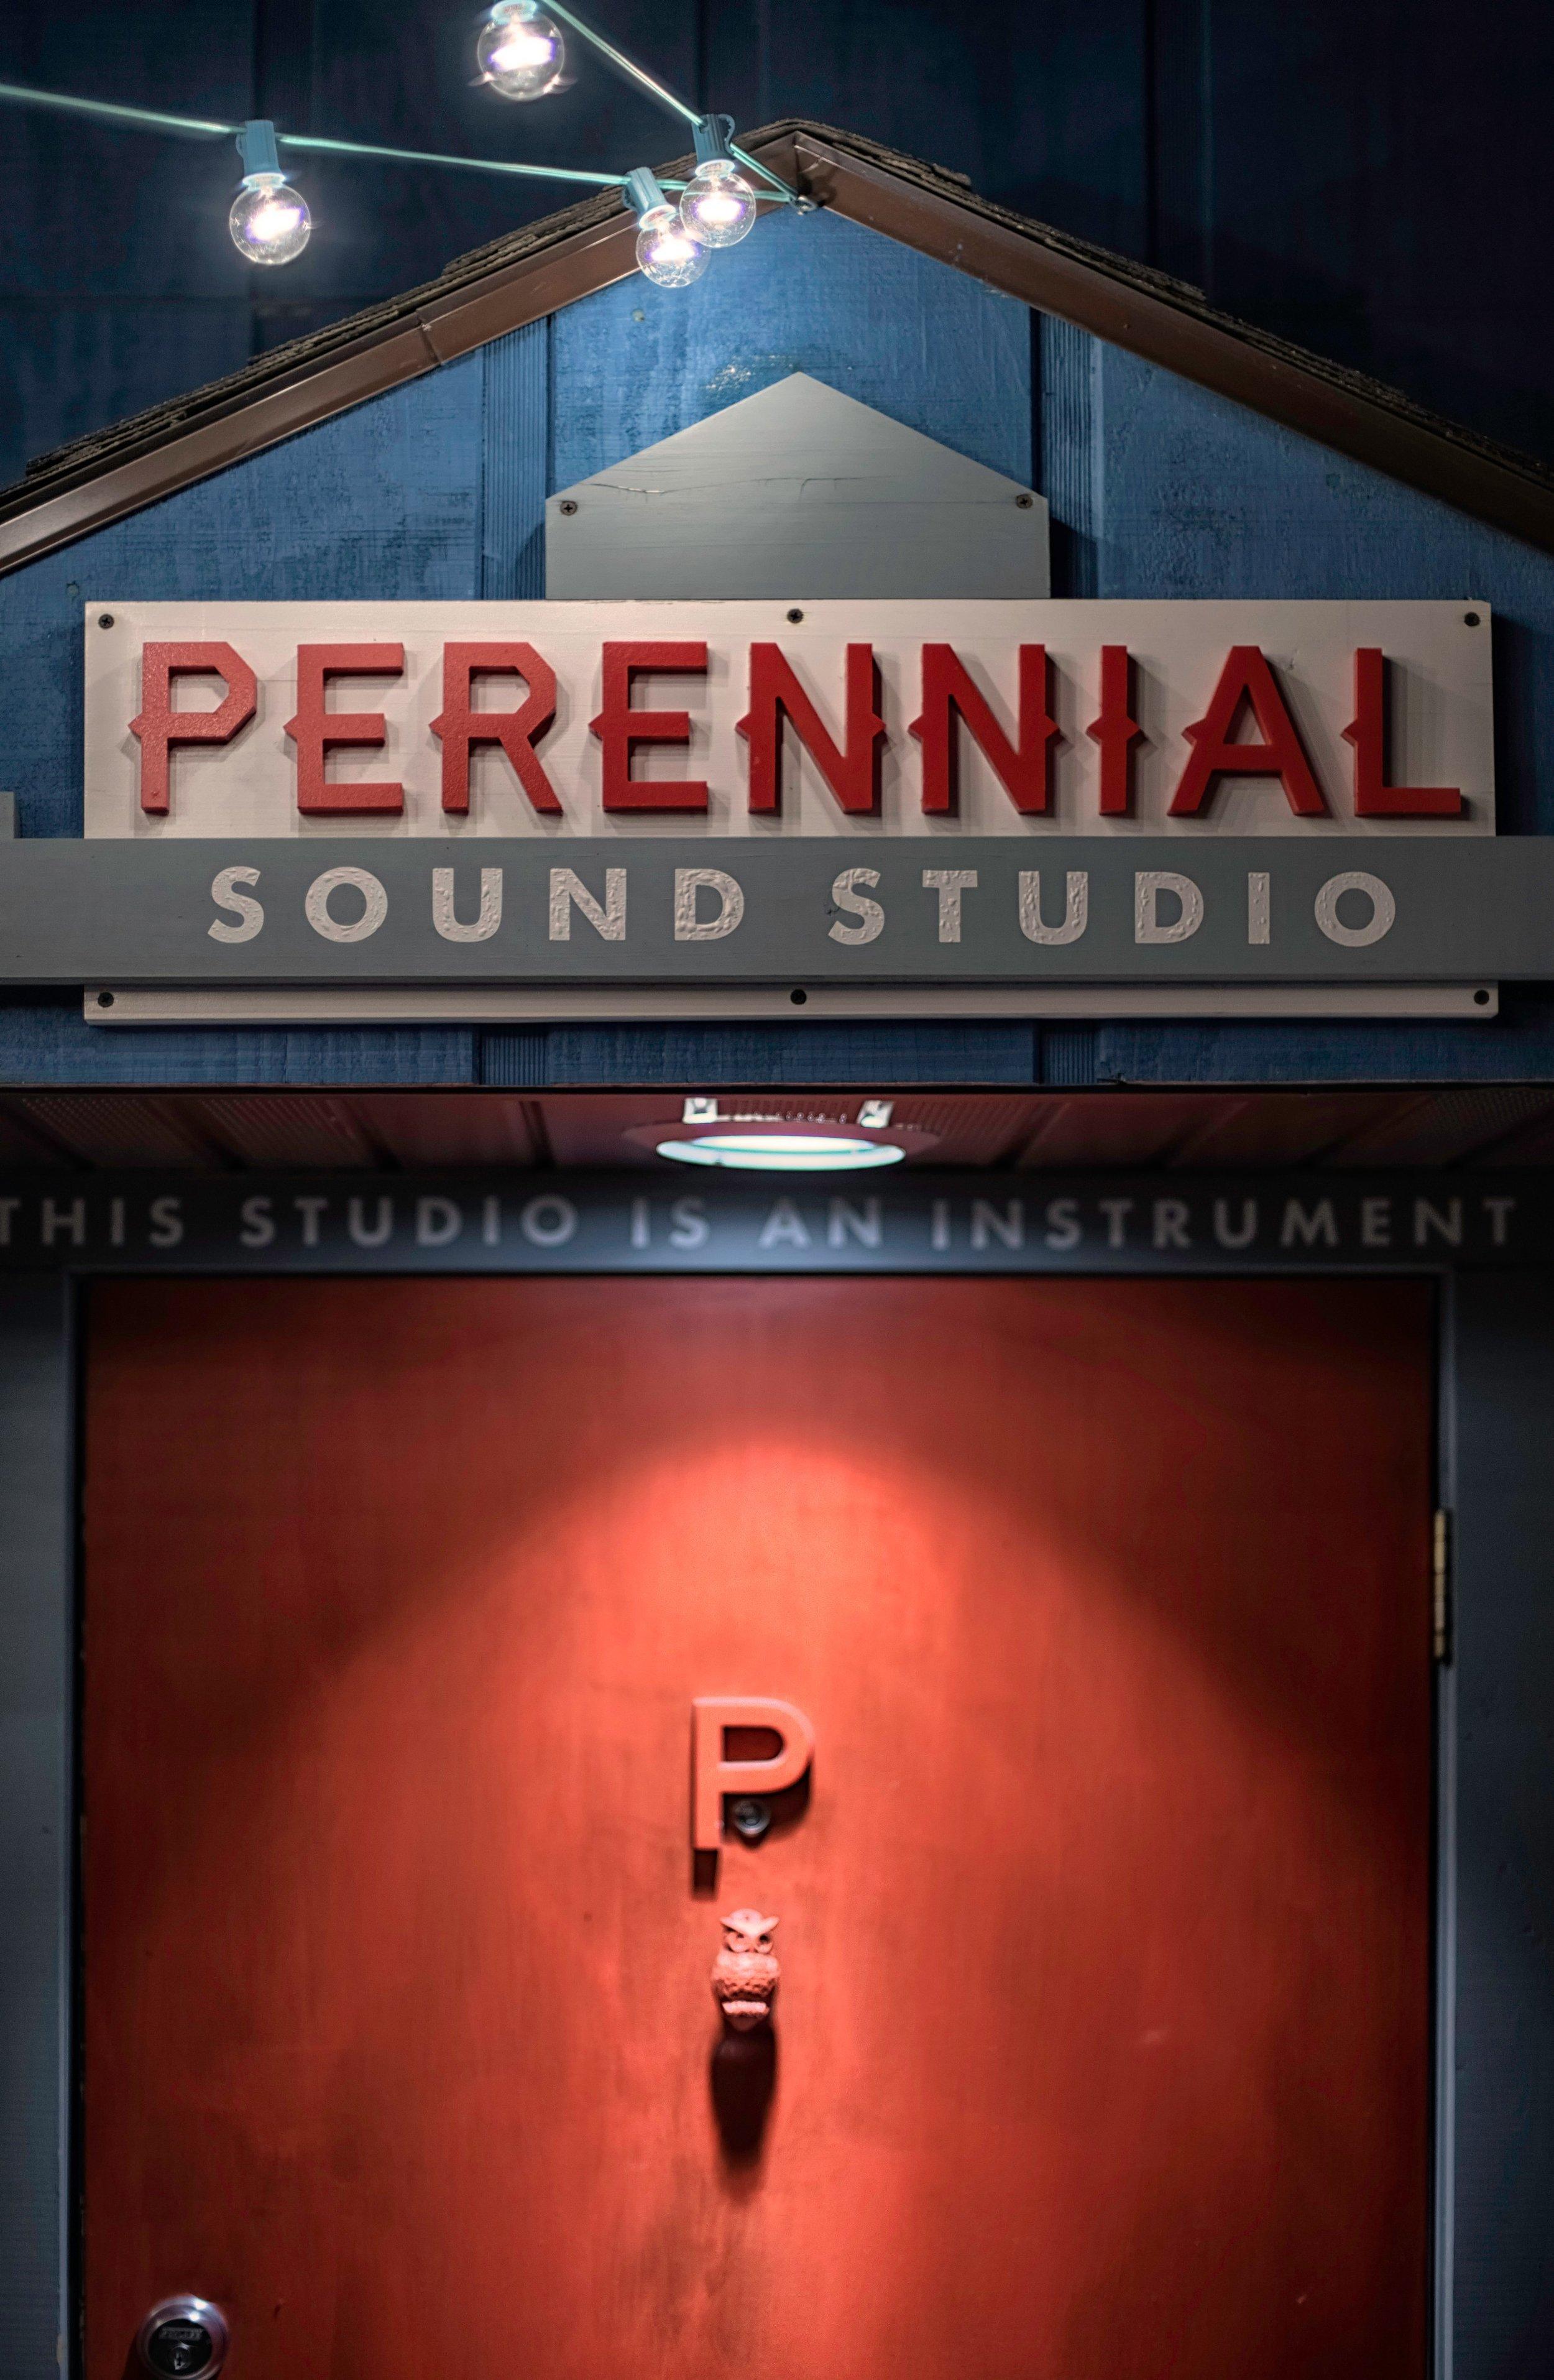 Perennial Sound 2018-08-17_022-Blended-(ZF-7871-92729-1-002).jpg